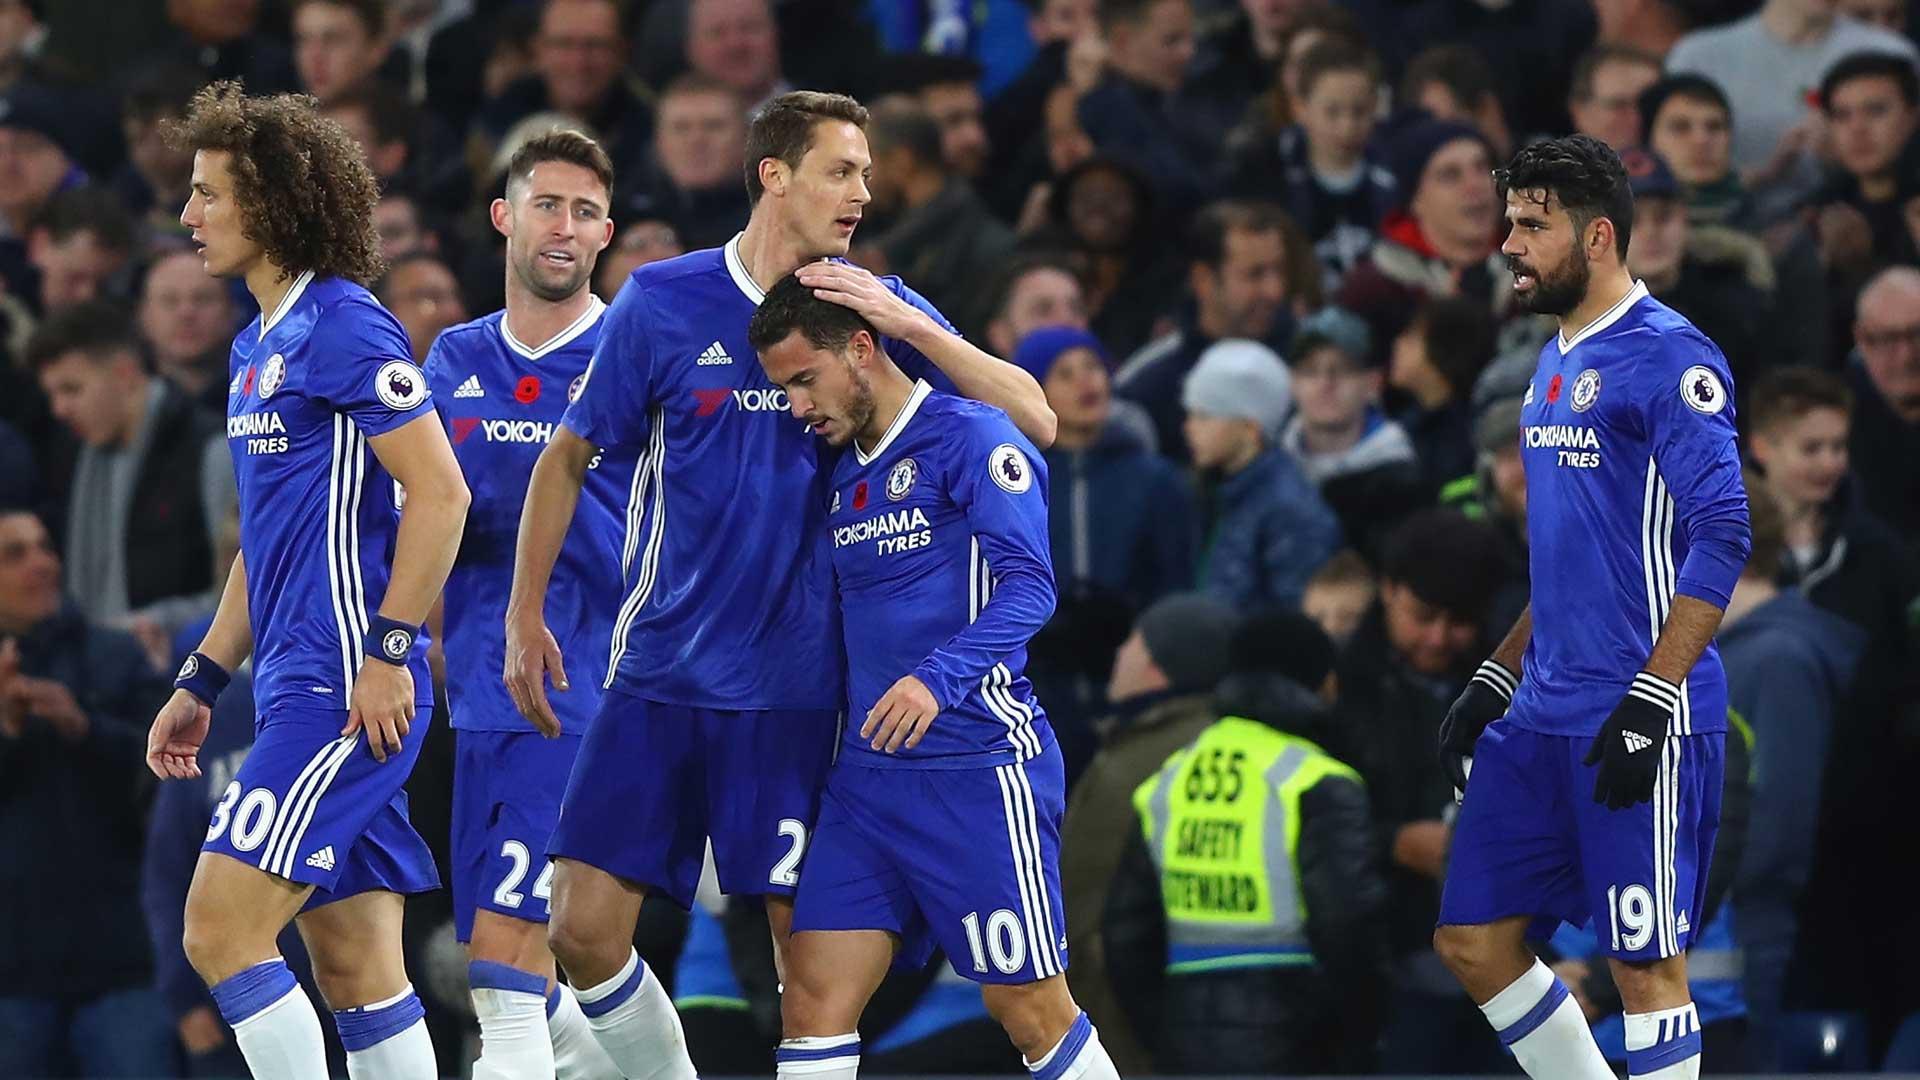 EPL: Chelsea annihilates Everton to go top